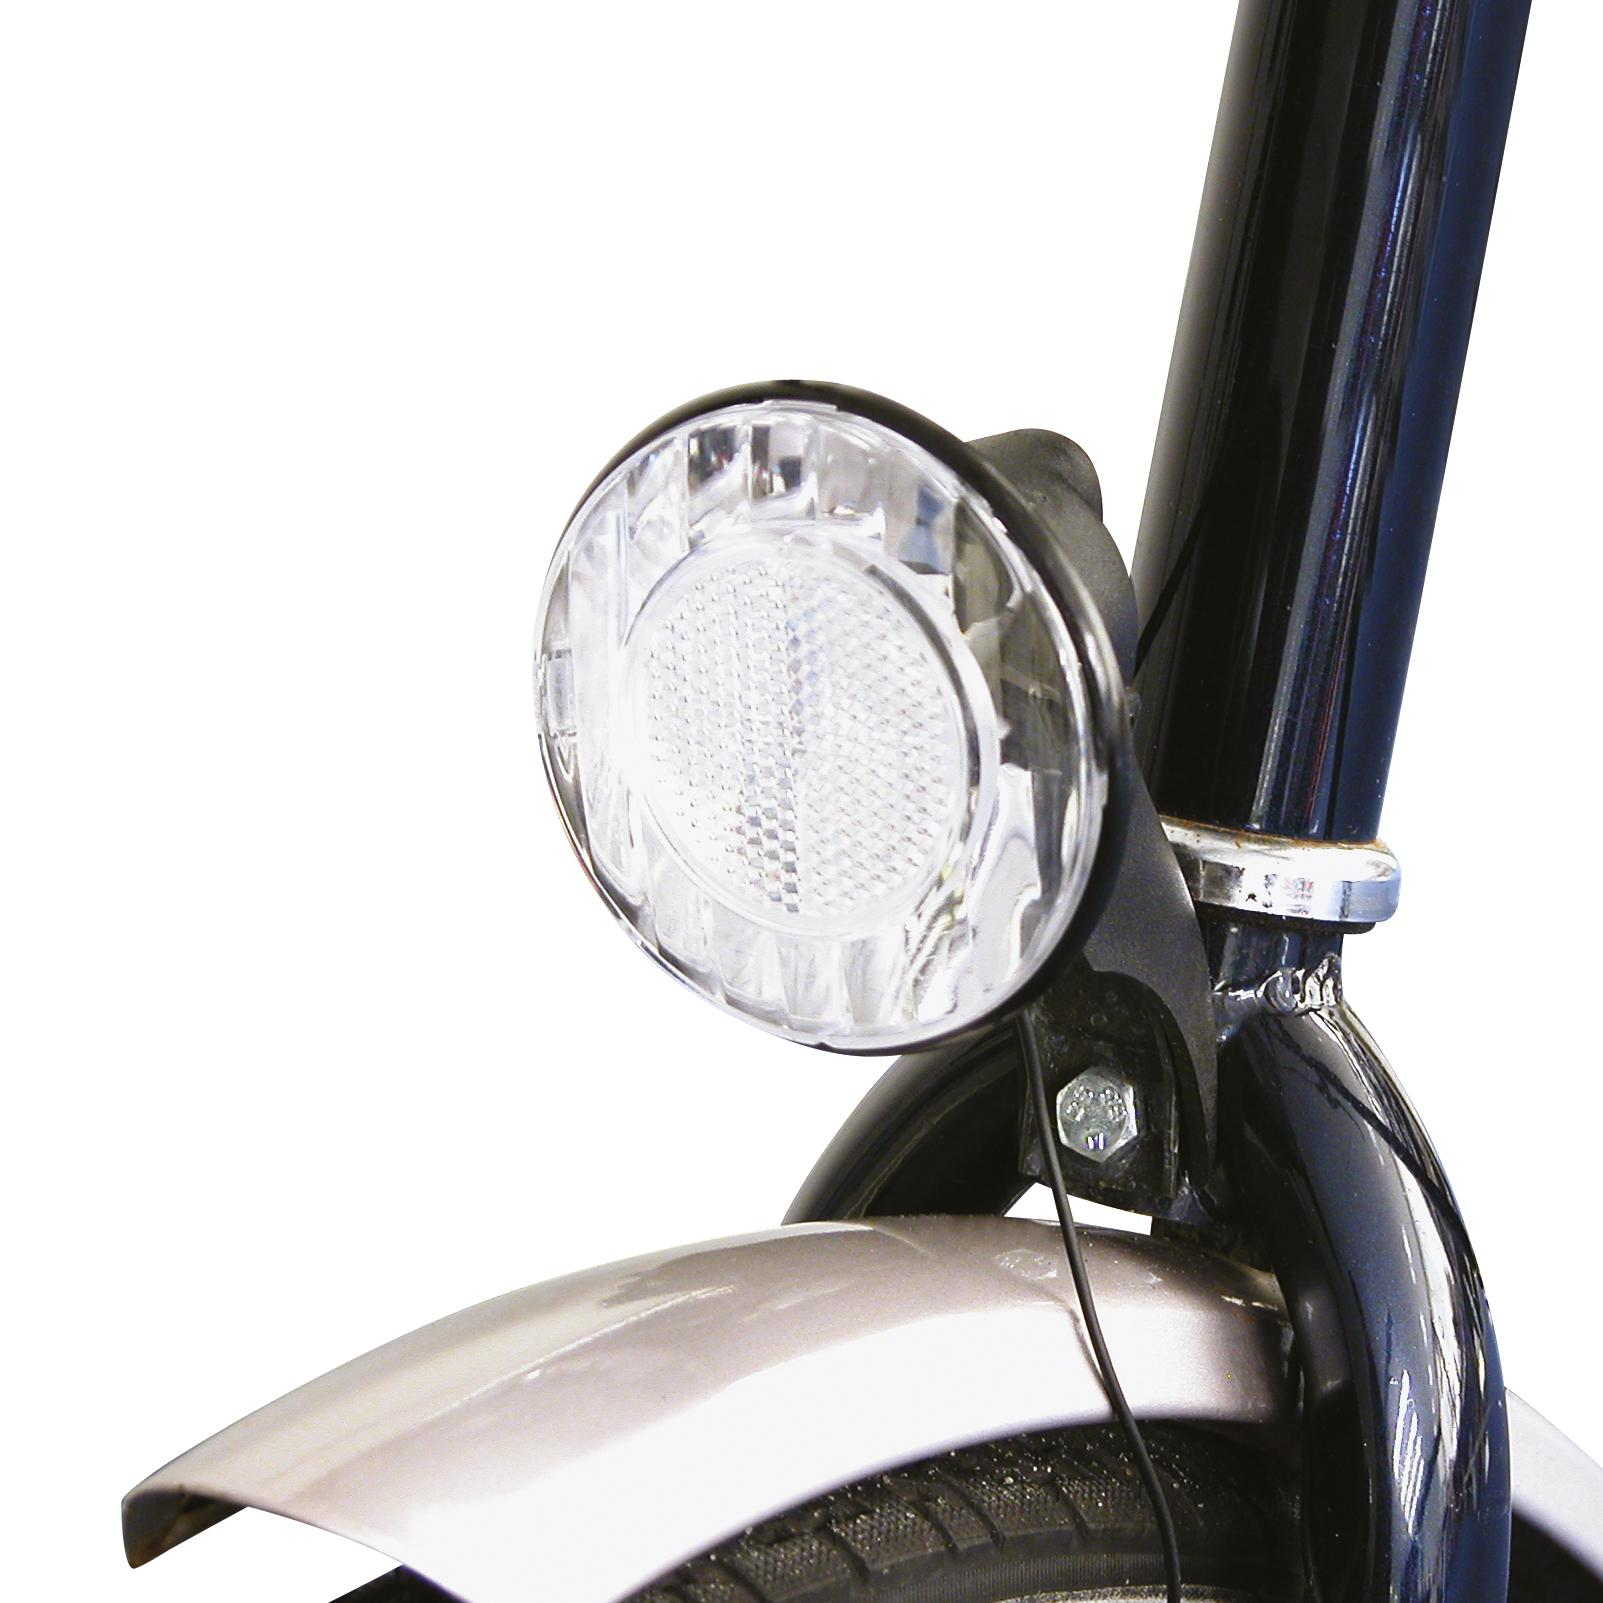 2 roues velos motos scooters adnautomid feu avant avec refle 221891. Black Bedroom Furniture Sets. Home Design Ideas